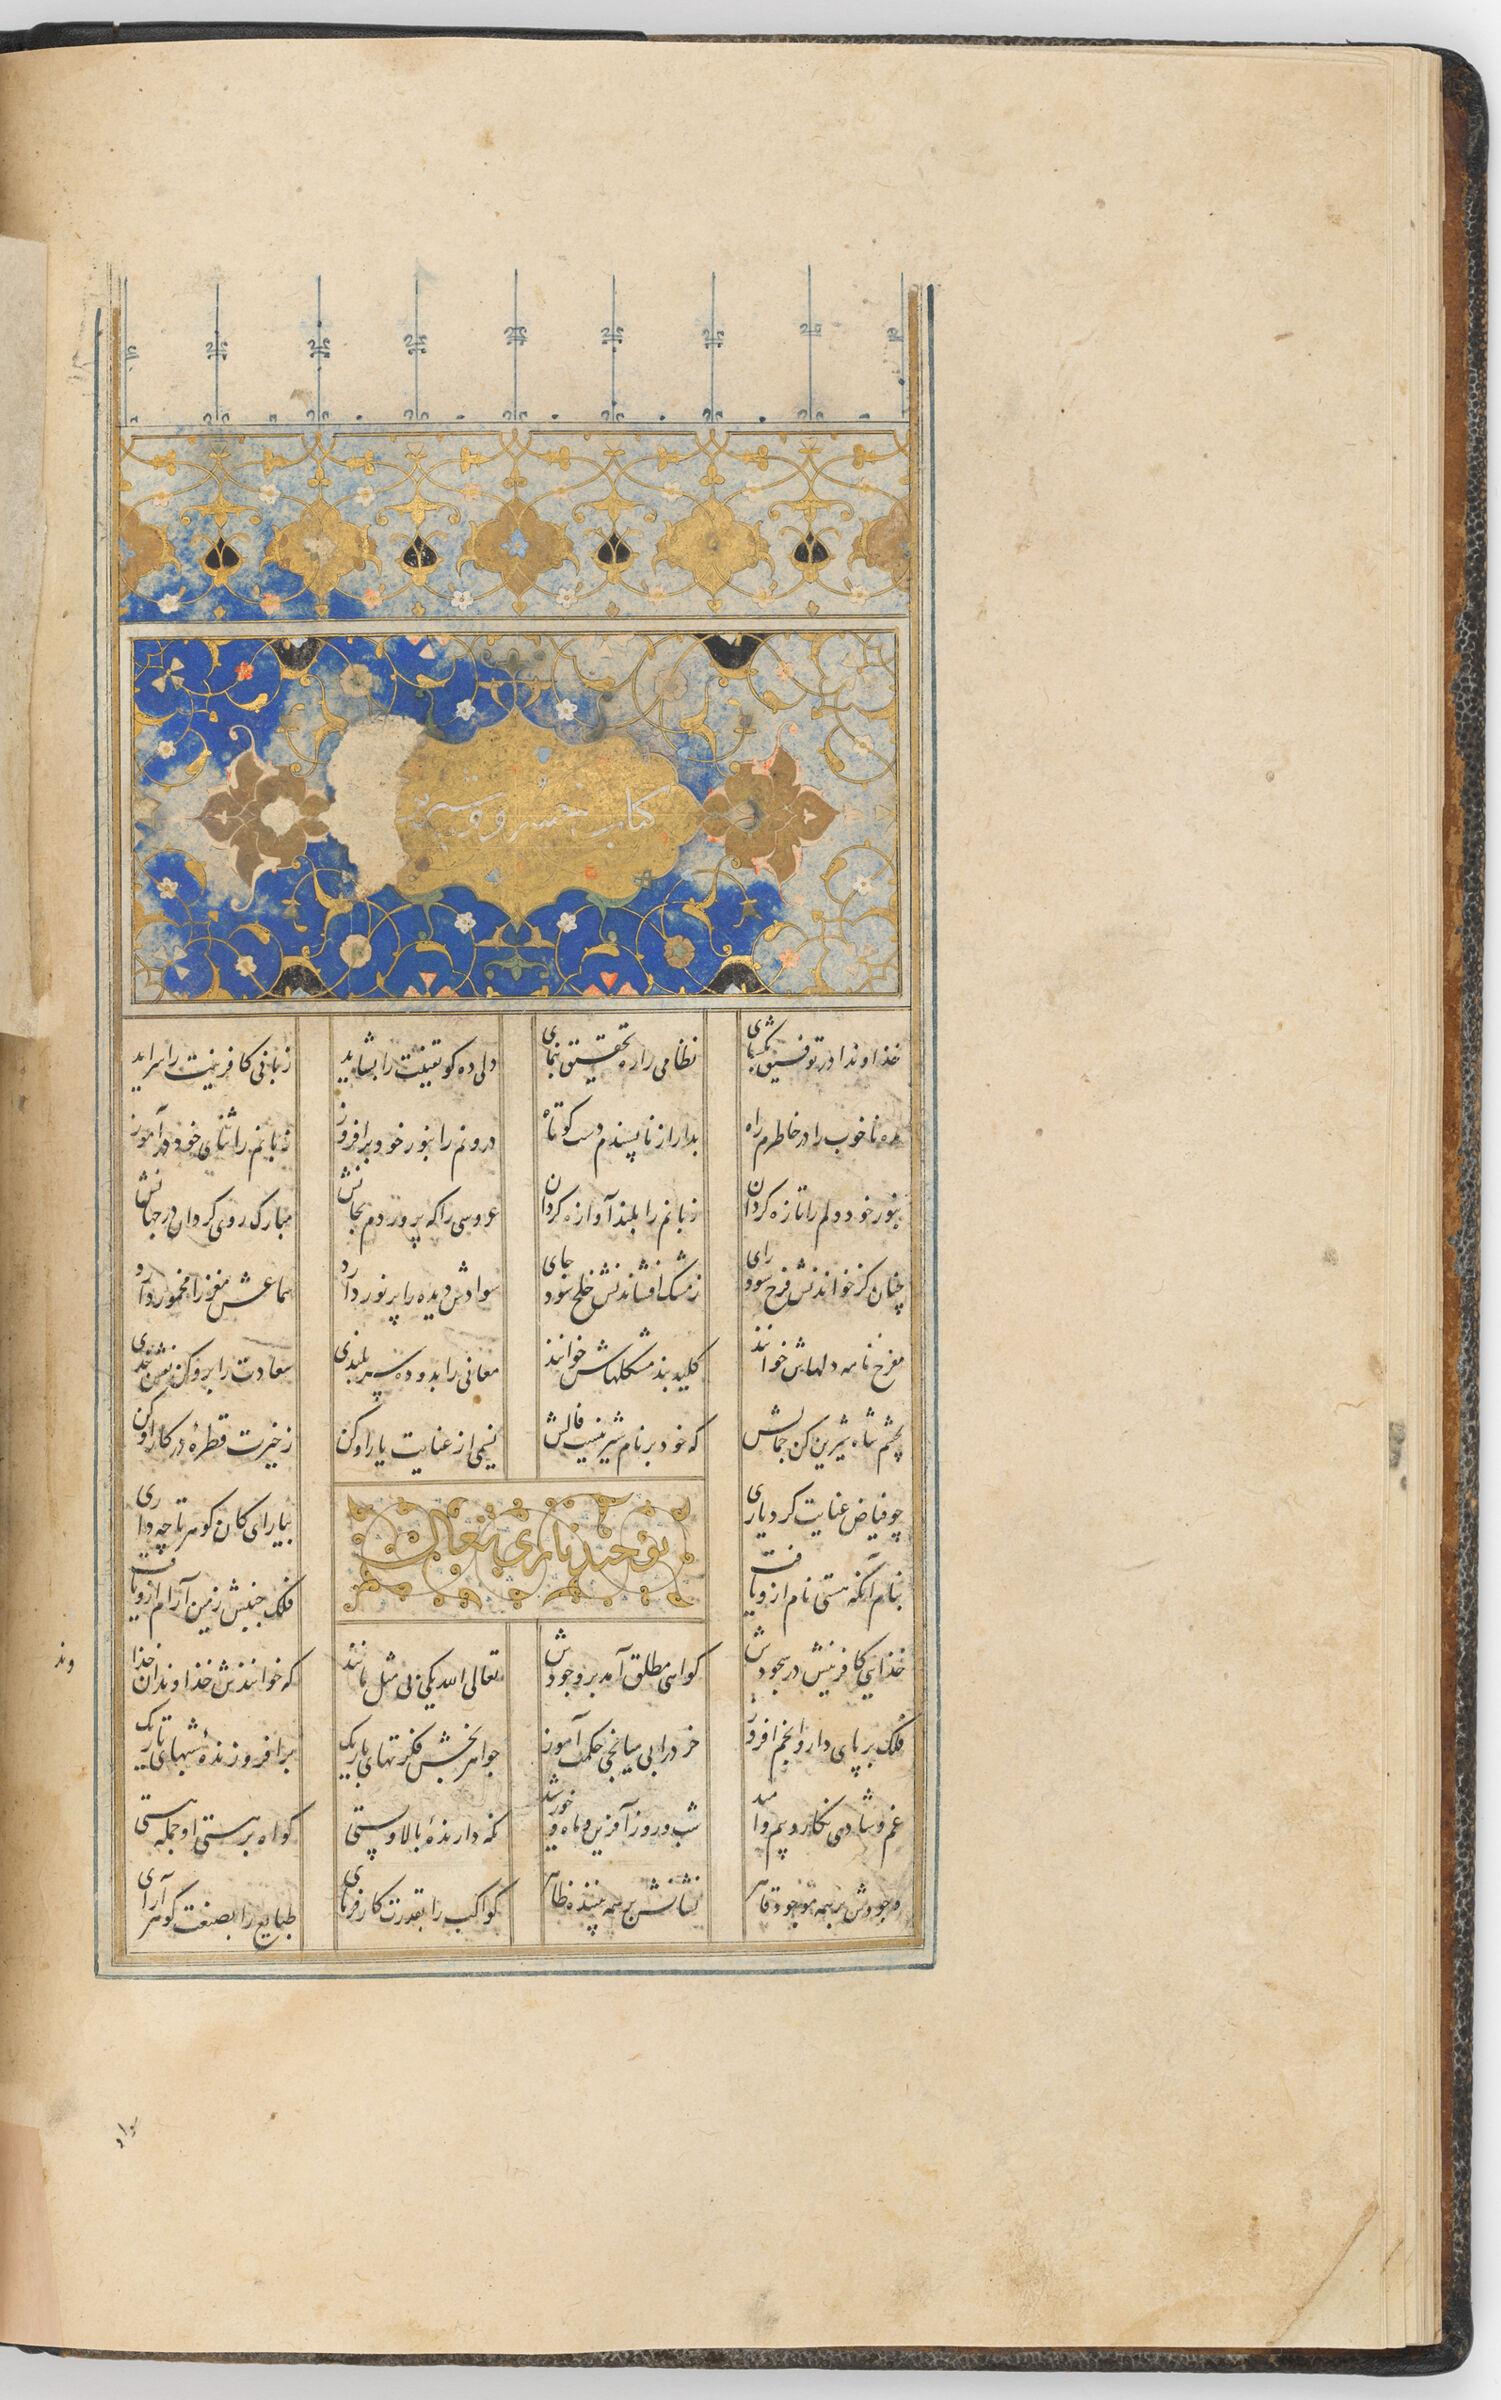 Illuminated Sarlawh Of The Khusraw And Shirin (Text Recto; Sarlawh Verso Of Folio 33), Sarlawh From A Manuscript Of The Khamsa By Nizam